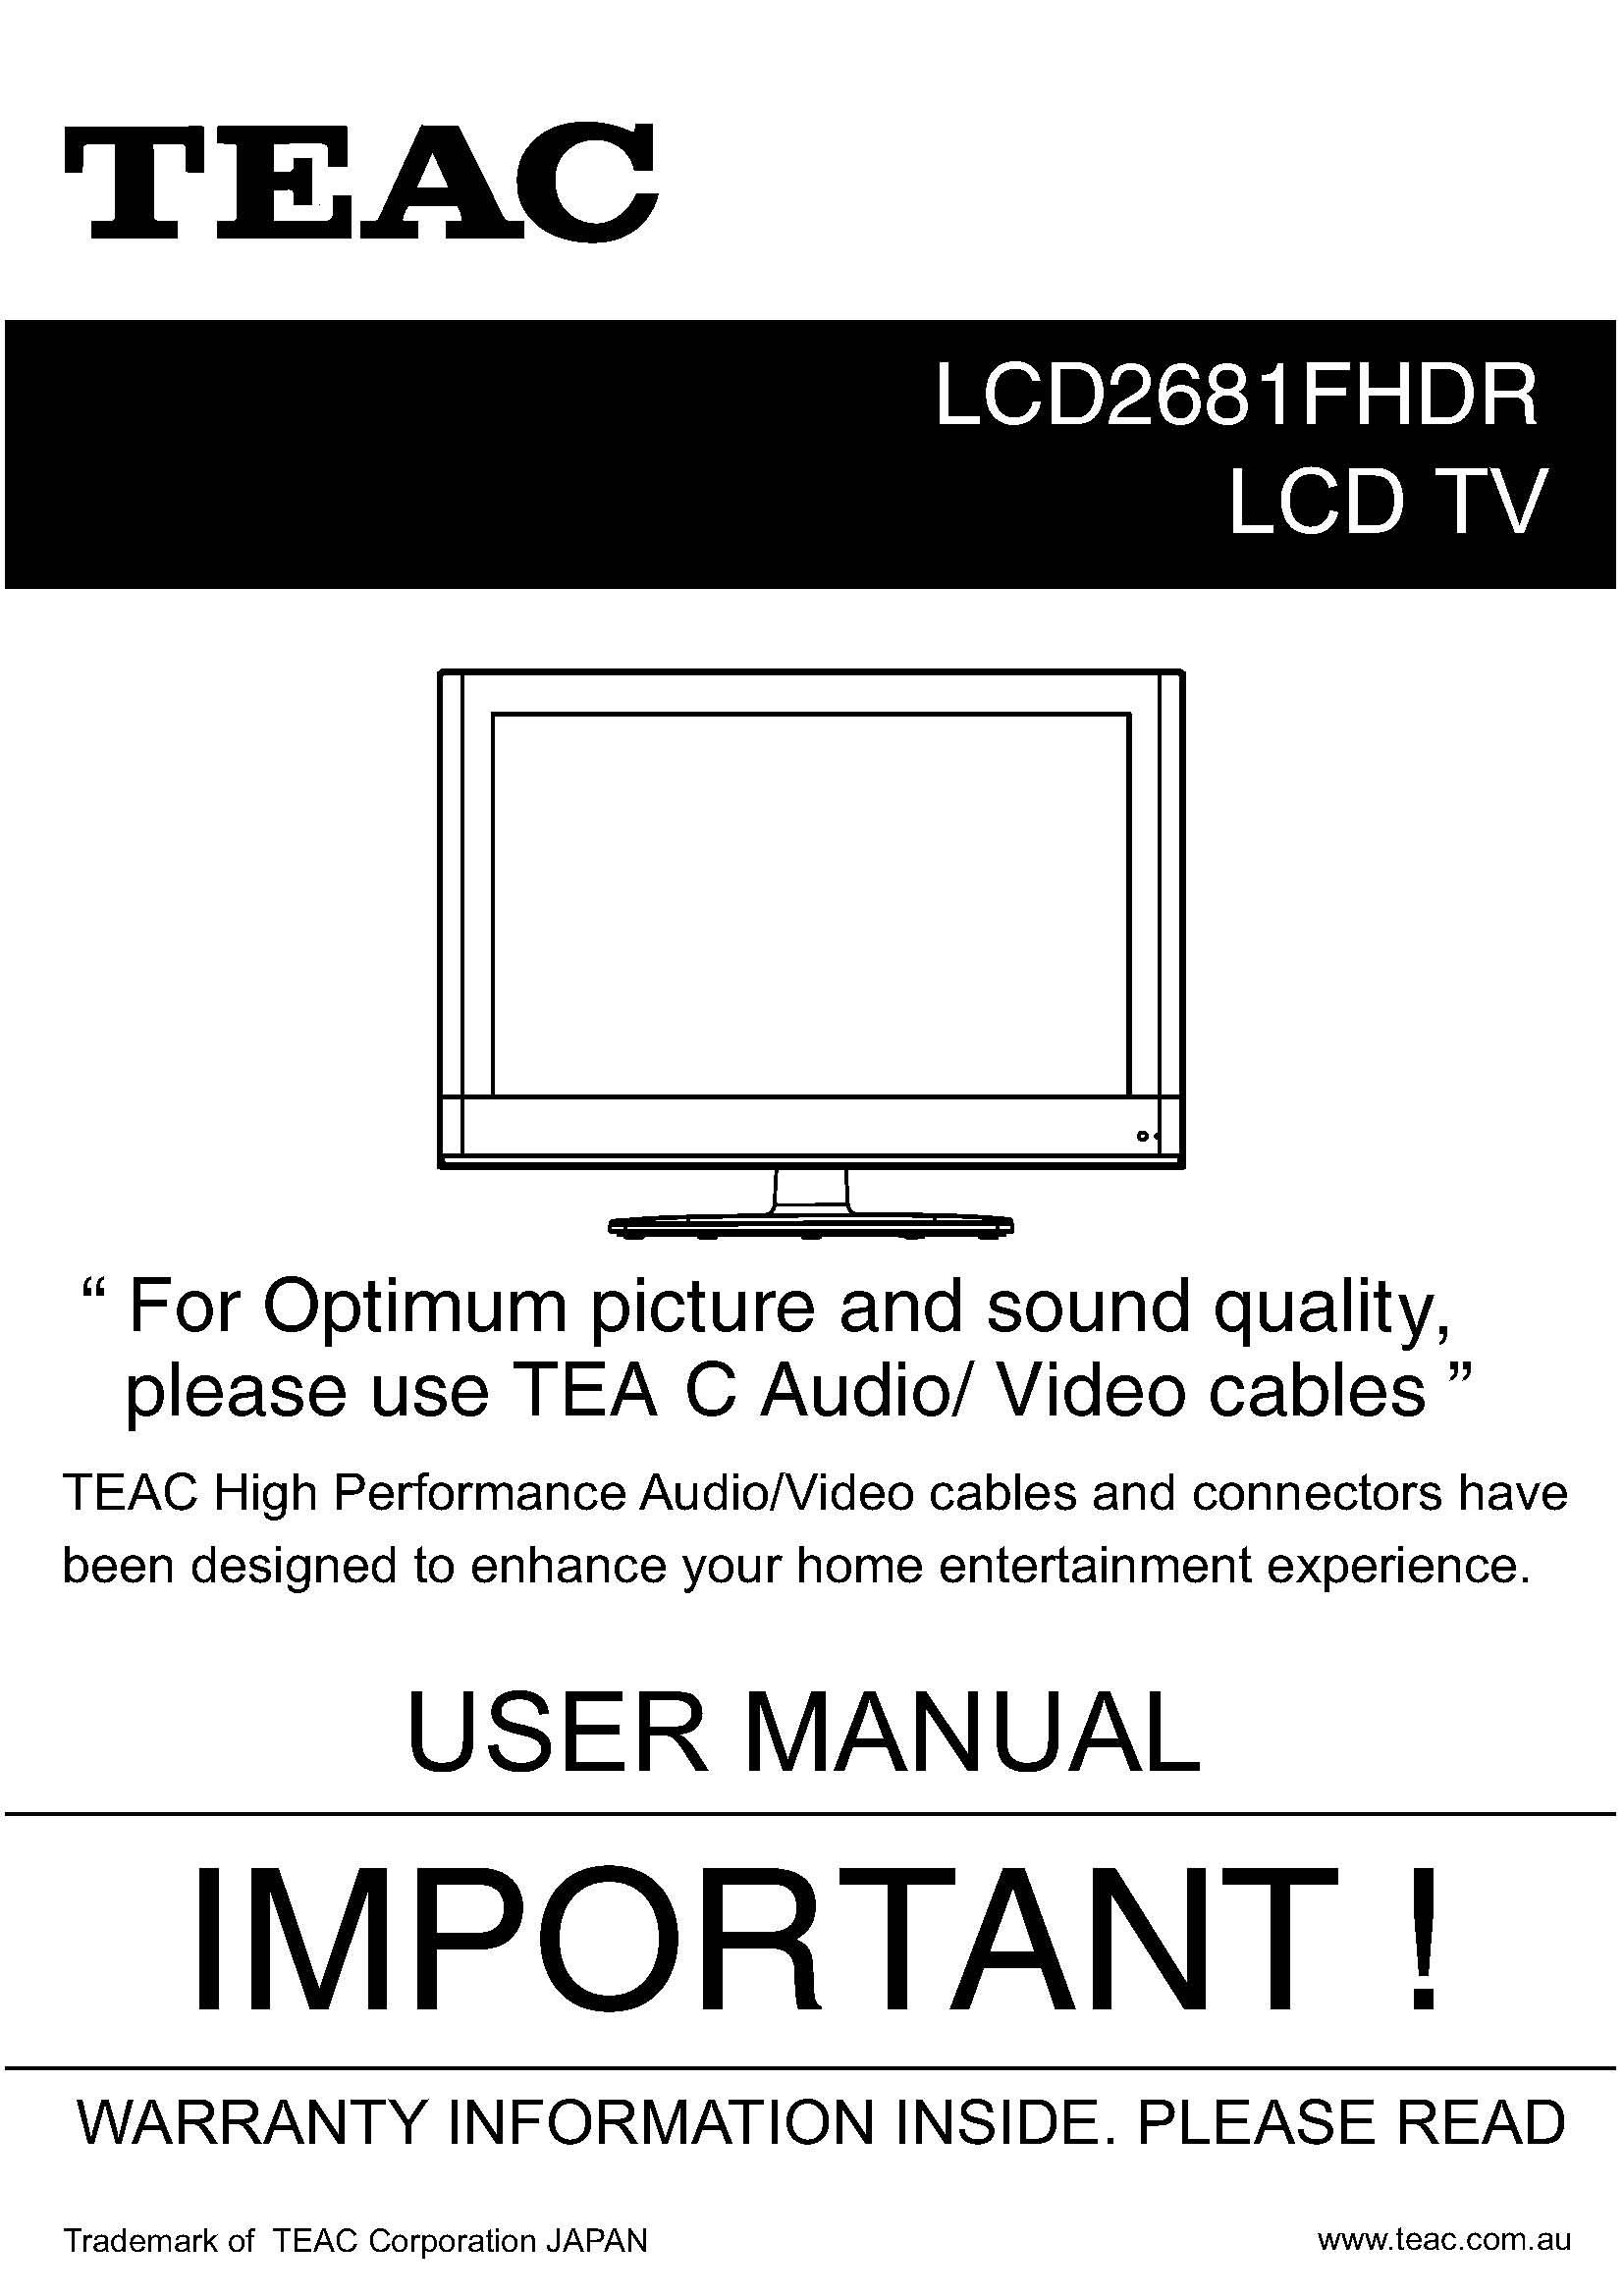 TEAC LCD2681FHDR User Manual